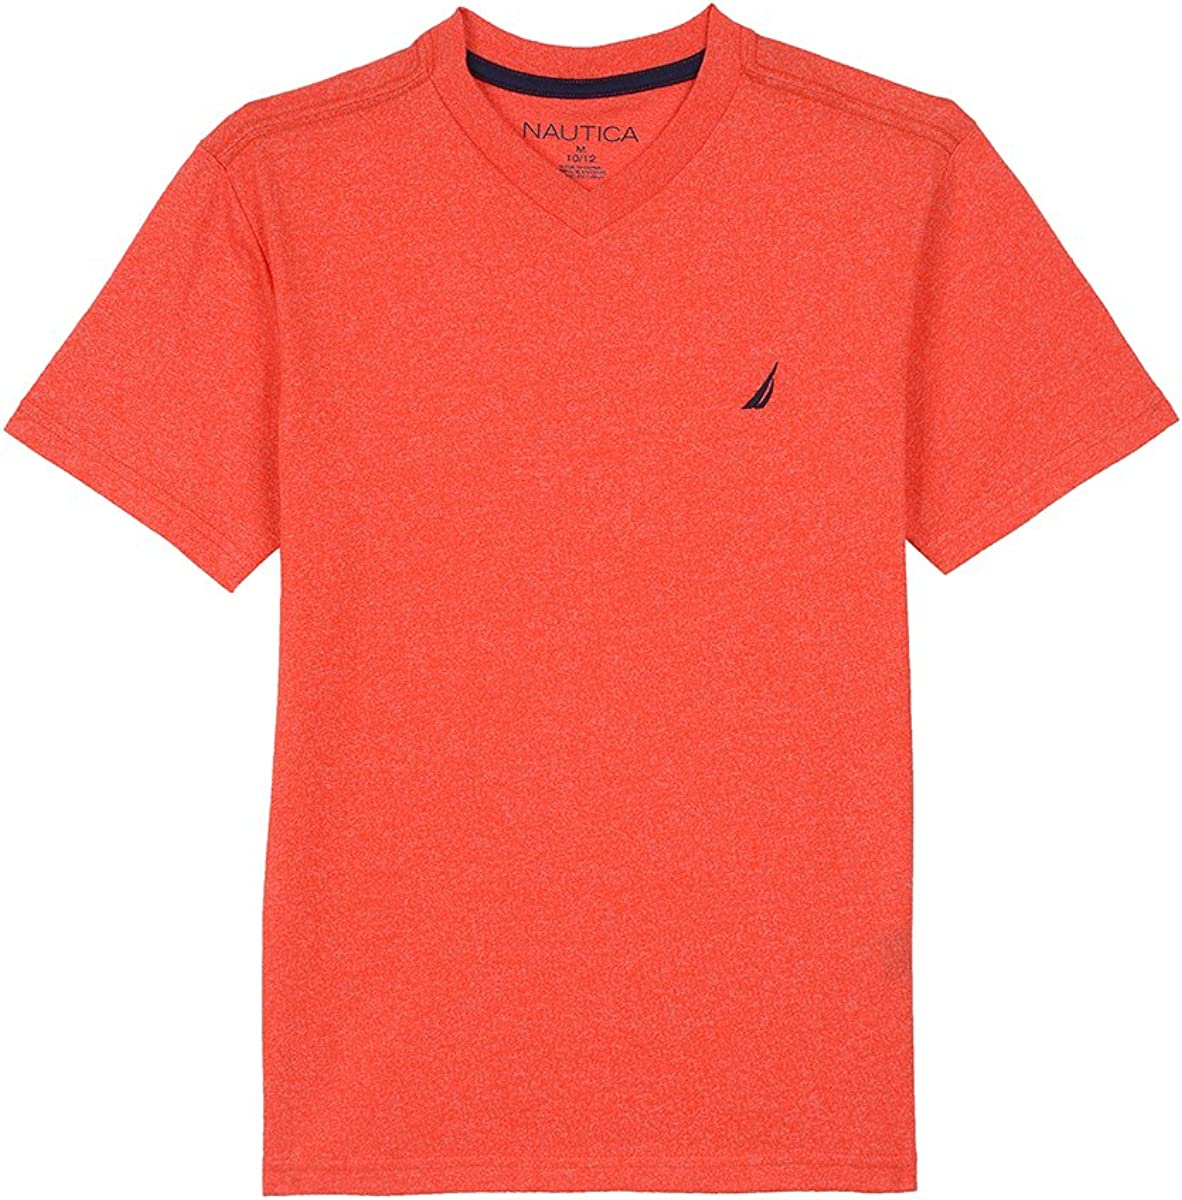 Nautica Boys Short Sleeve Solid V-Neck T-Shirt